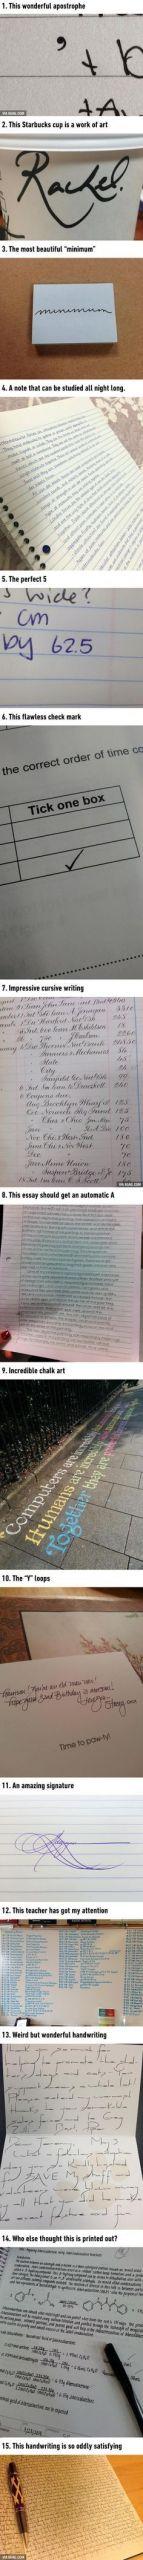 bf a7b ea3f06a13bdc329b amazing handwriting perfect cursive handwriting